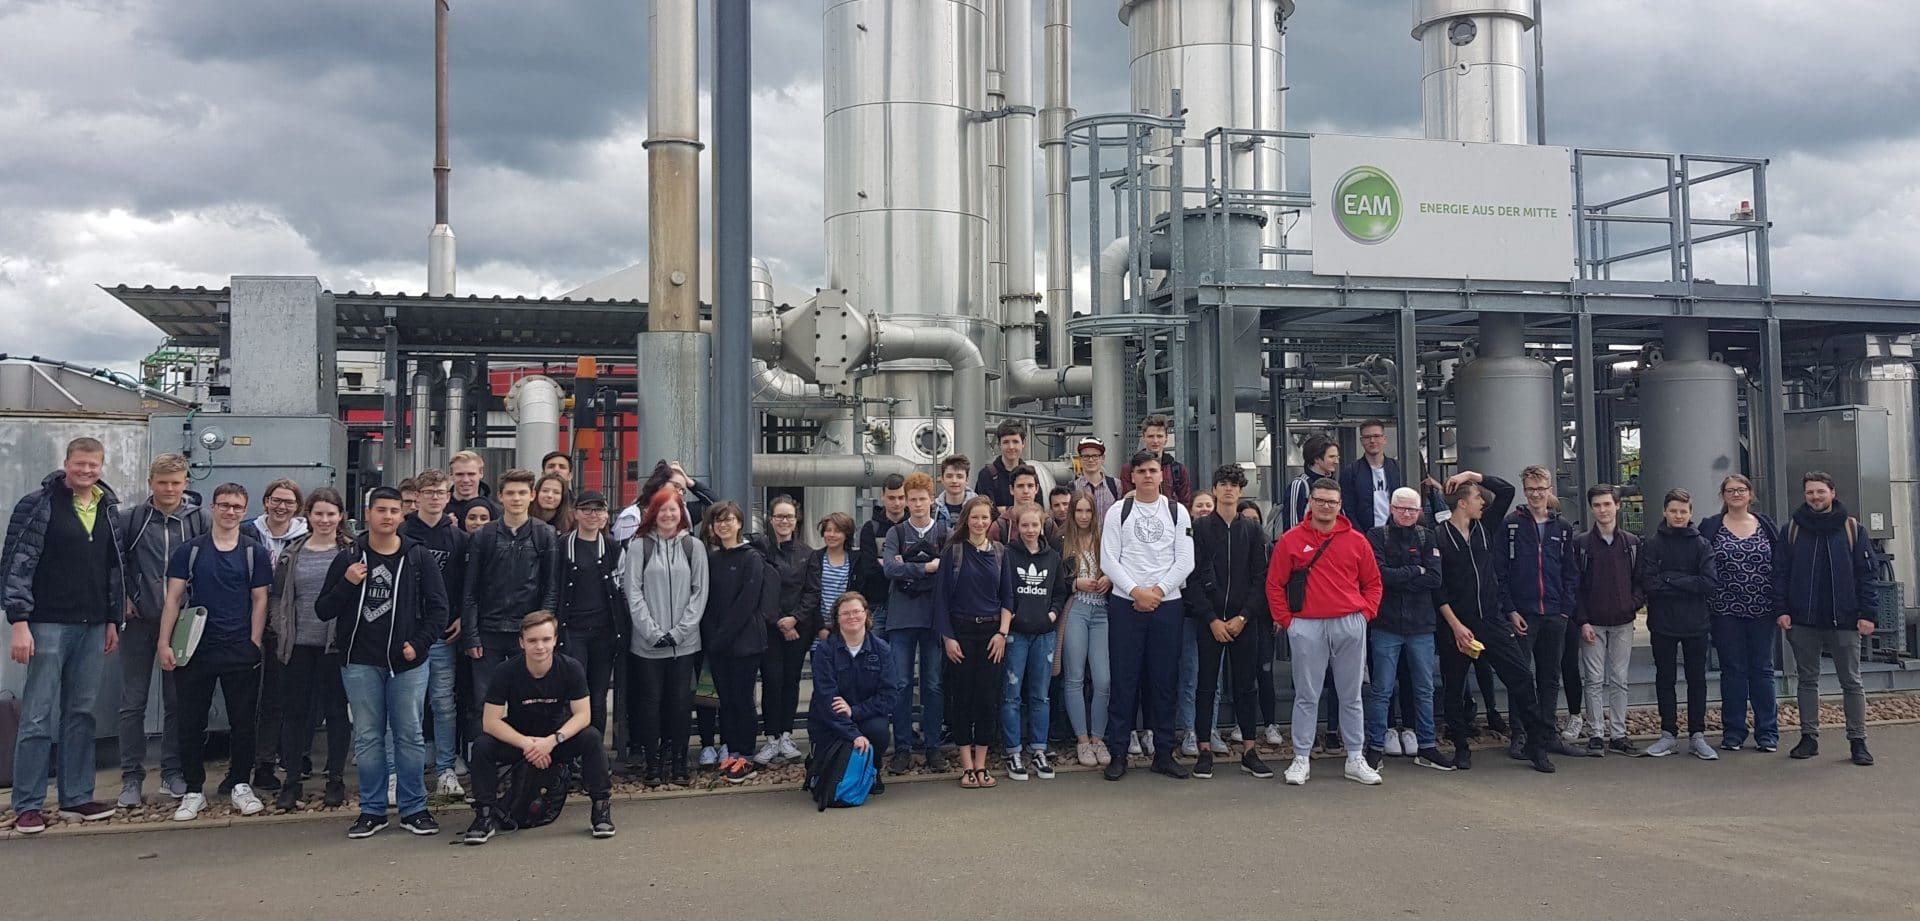 Biogasanlage statt Klassenzimmer